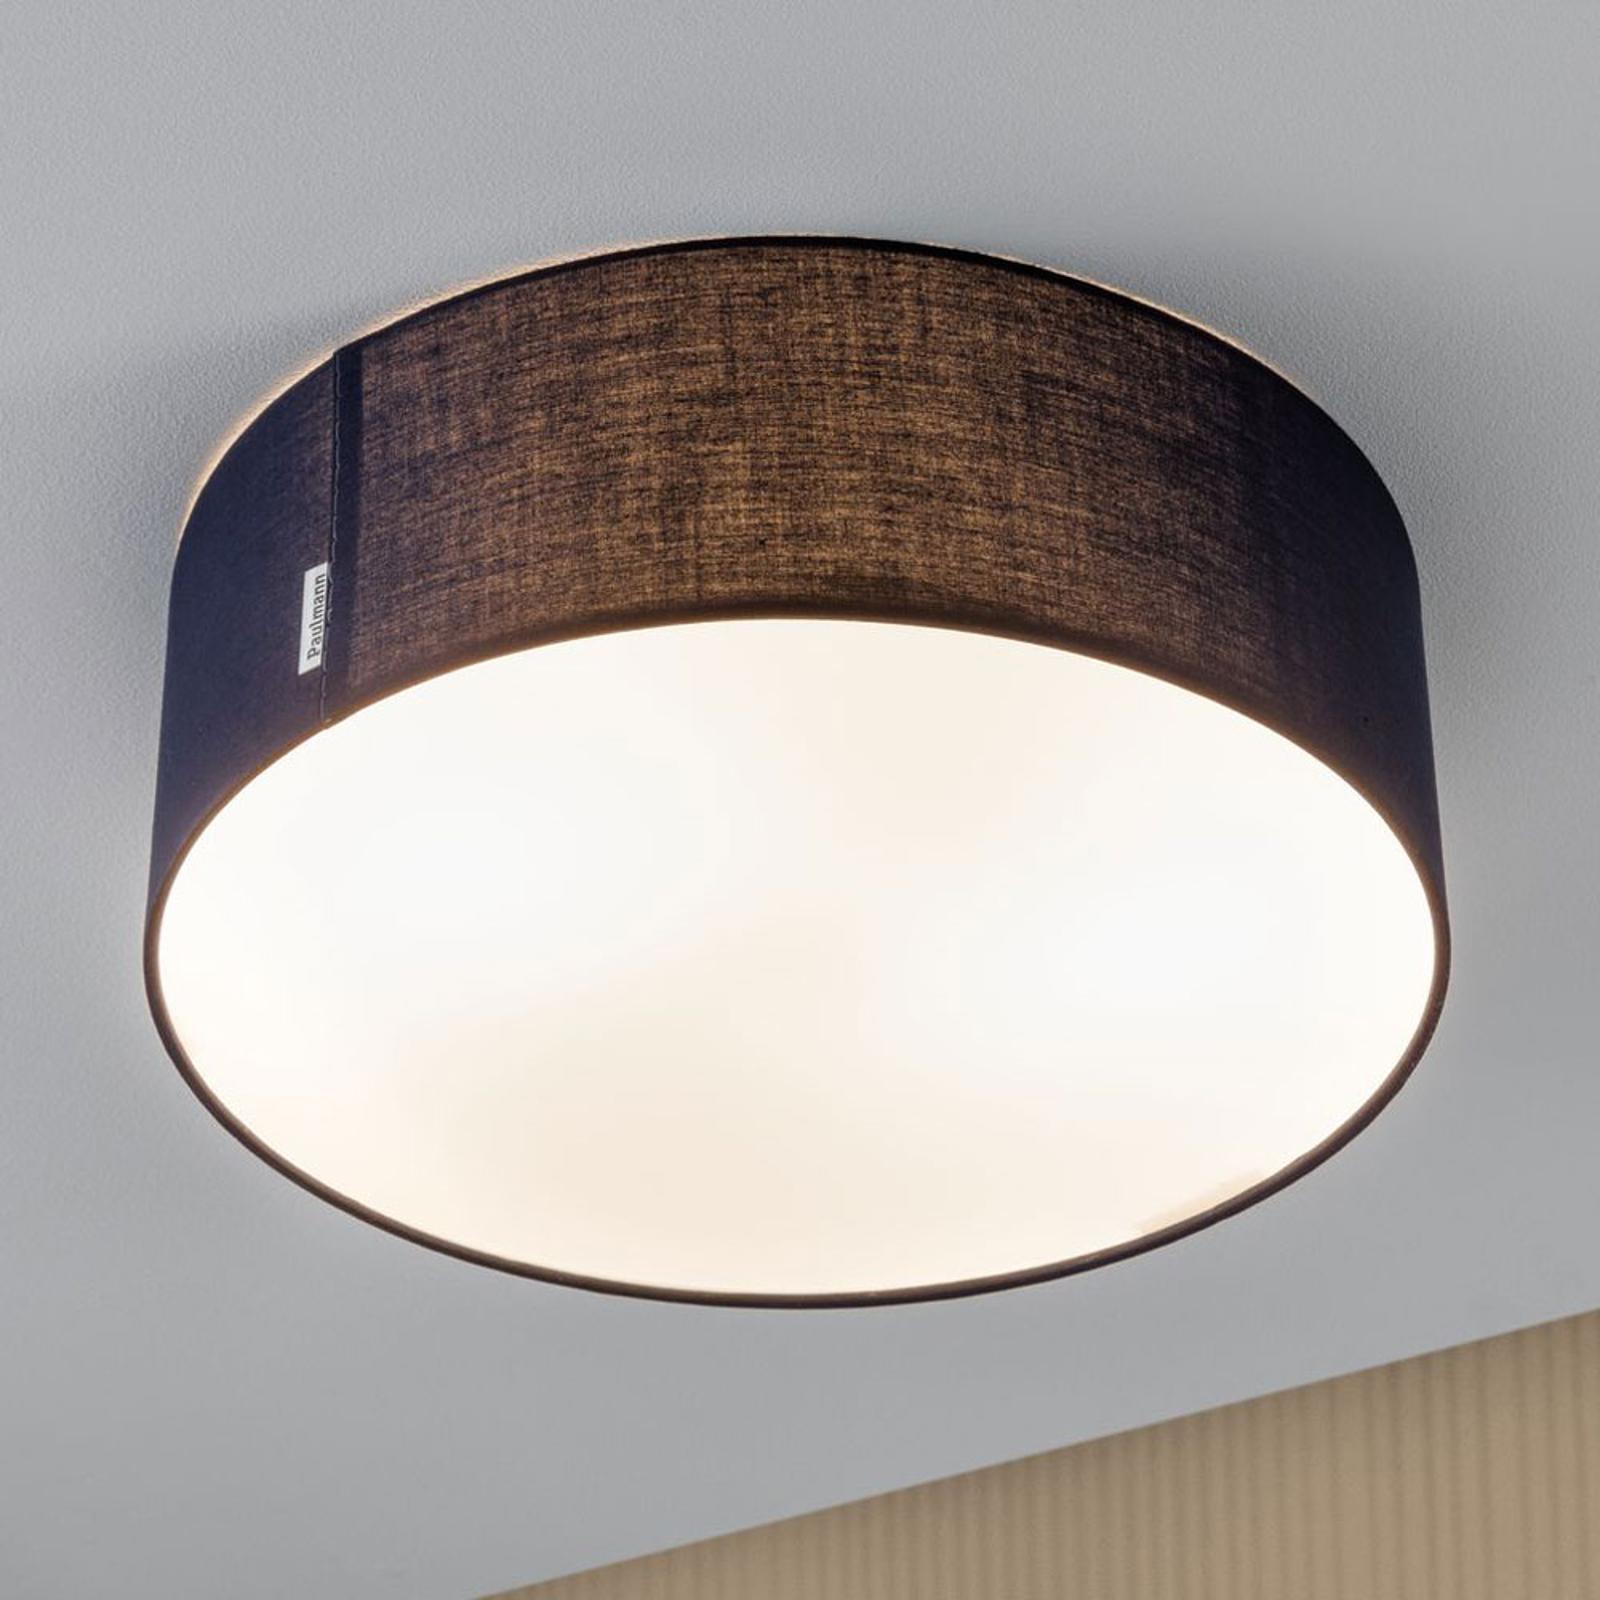 Paulmann Mari plafondlamp, blauw